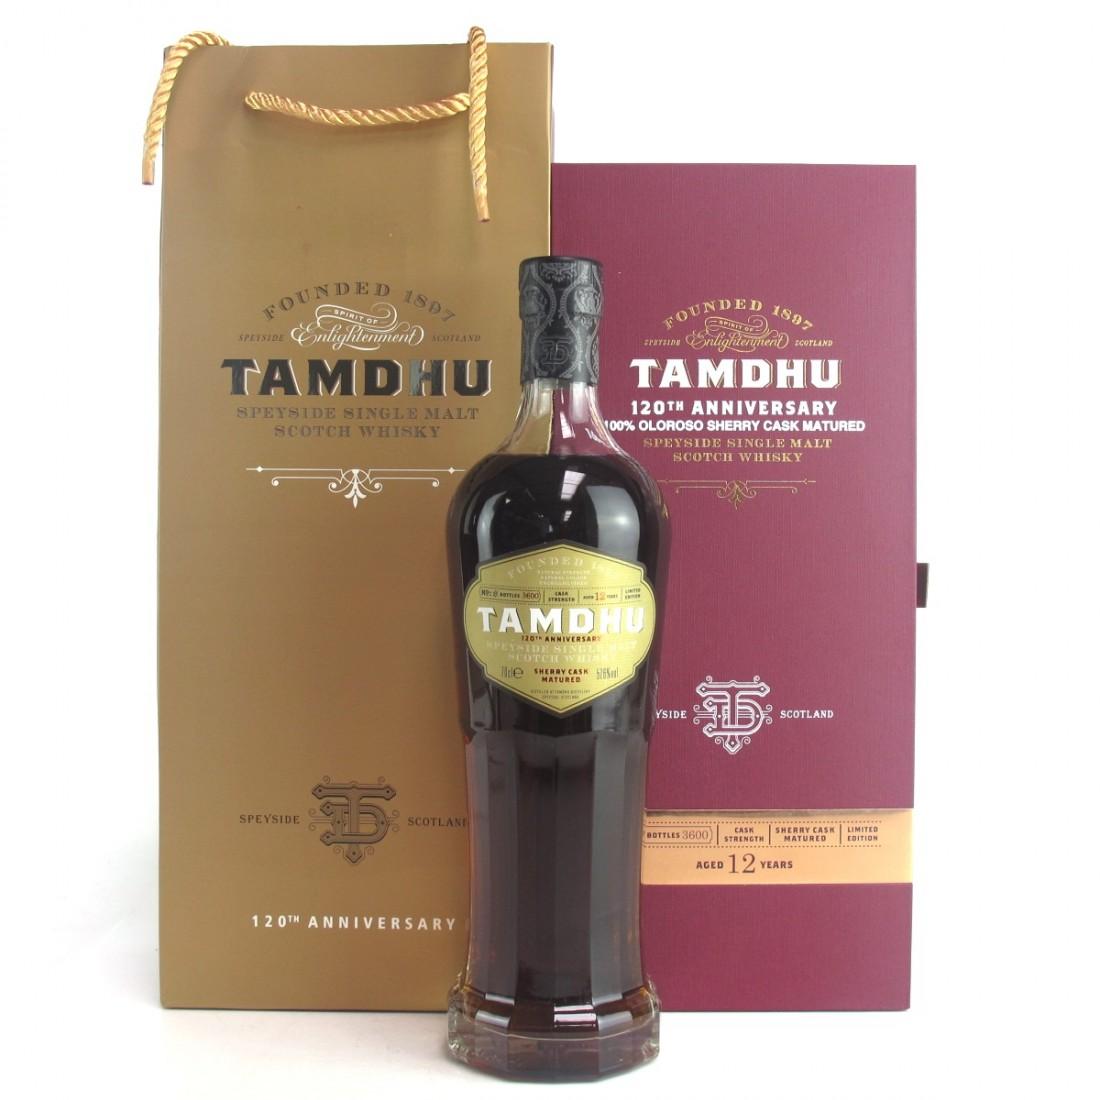 Tamdhu 120th Anniversary 12 Year Old / Taiwan Exclusive